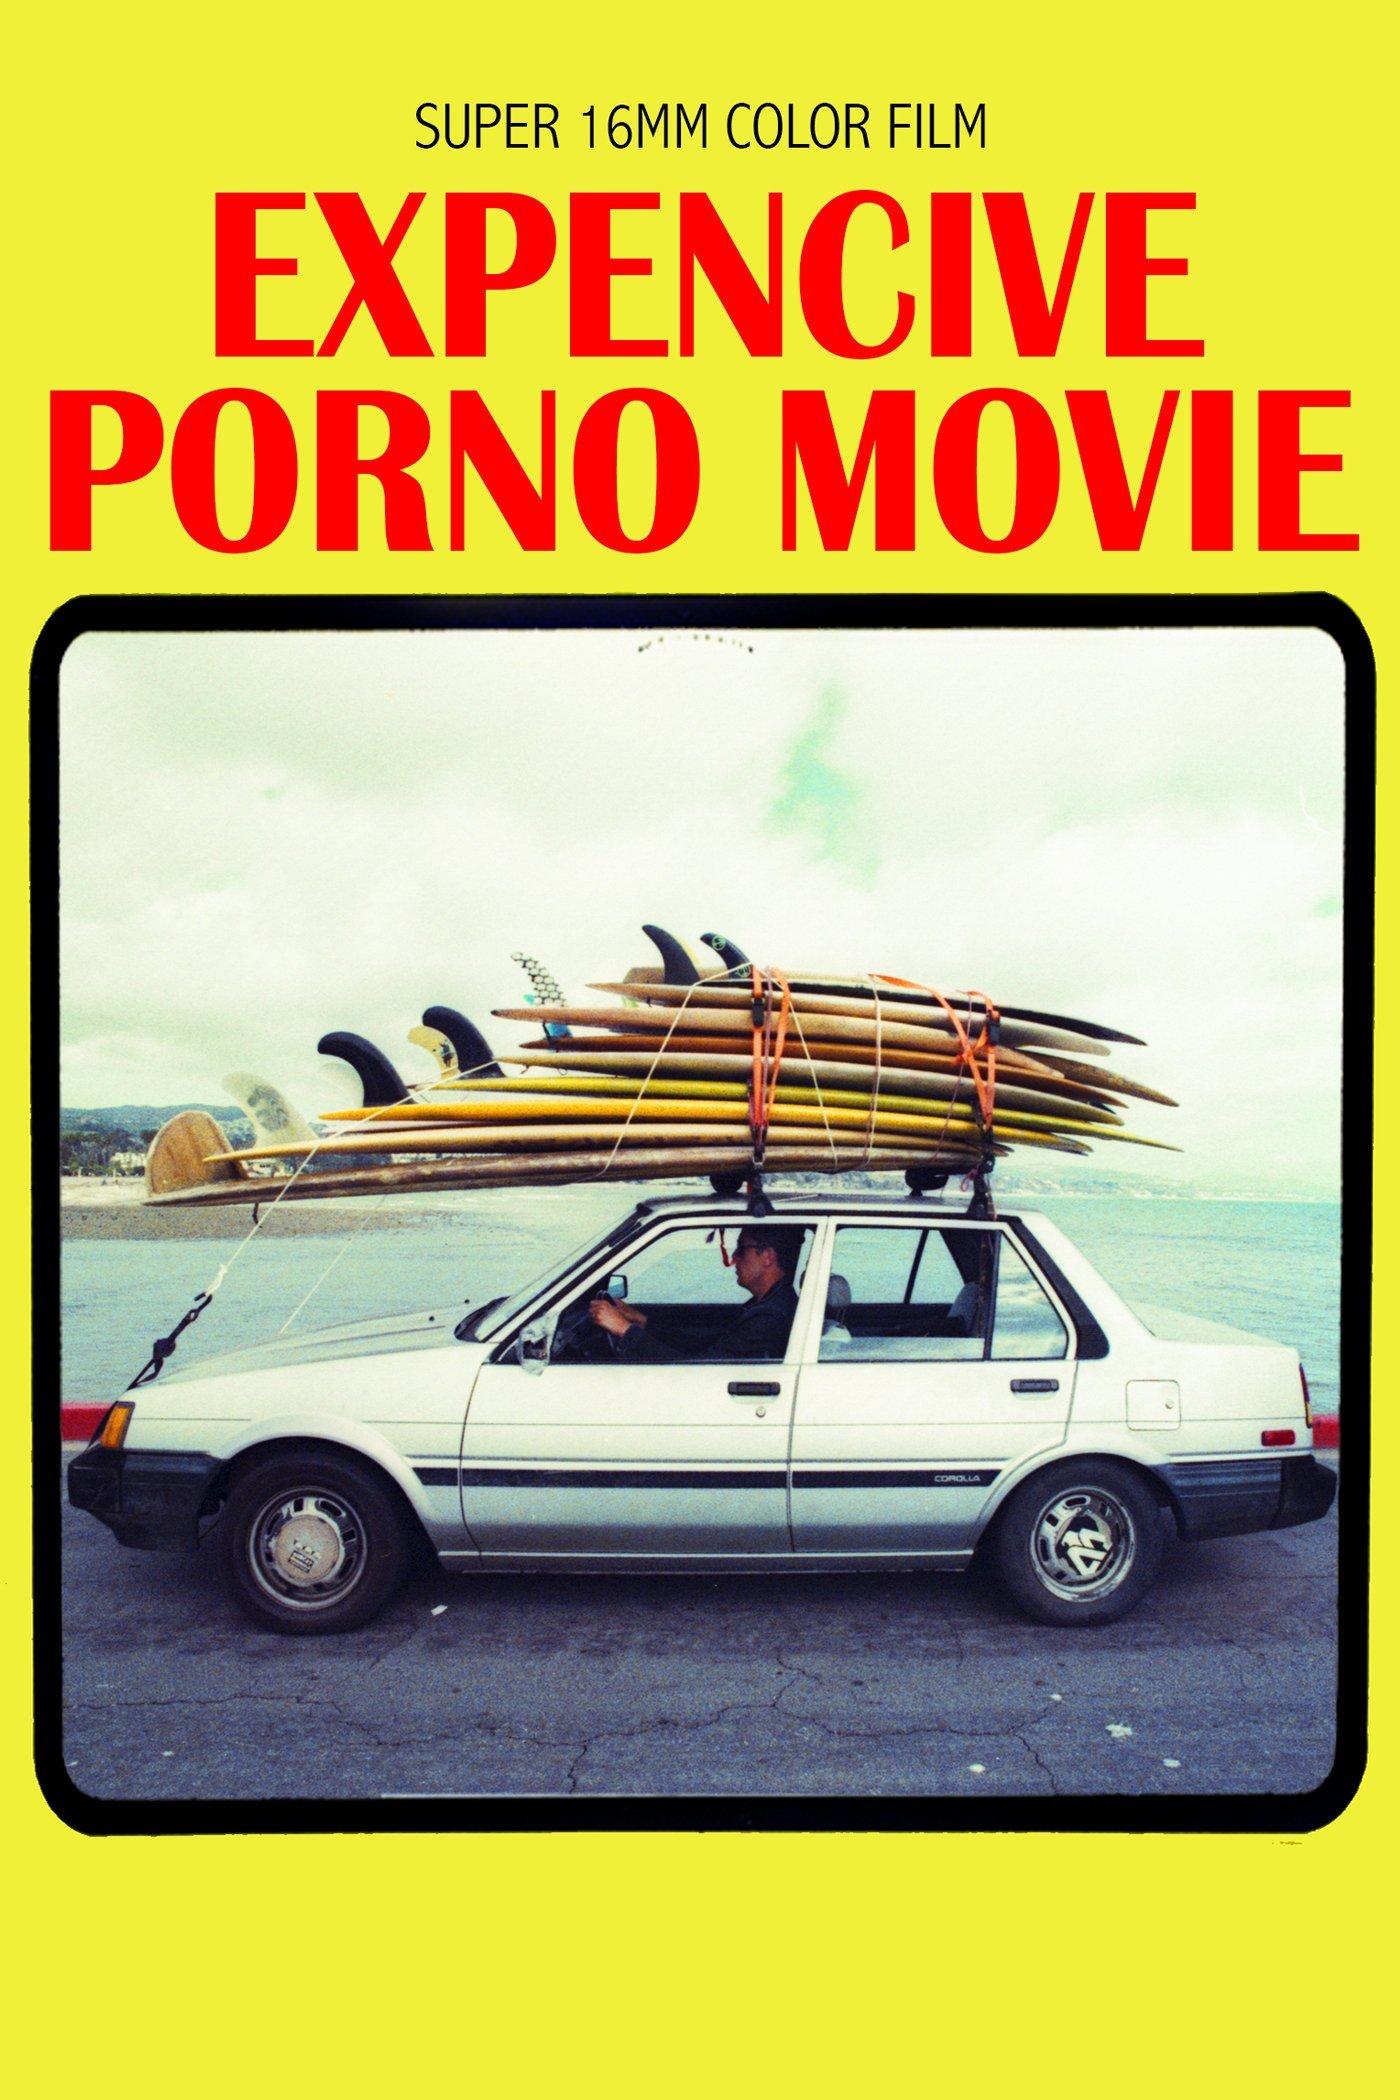 Expencive Porno by